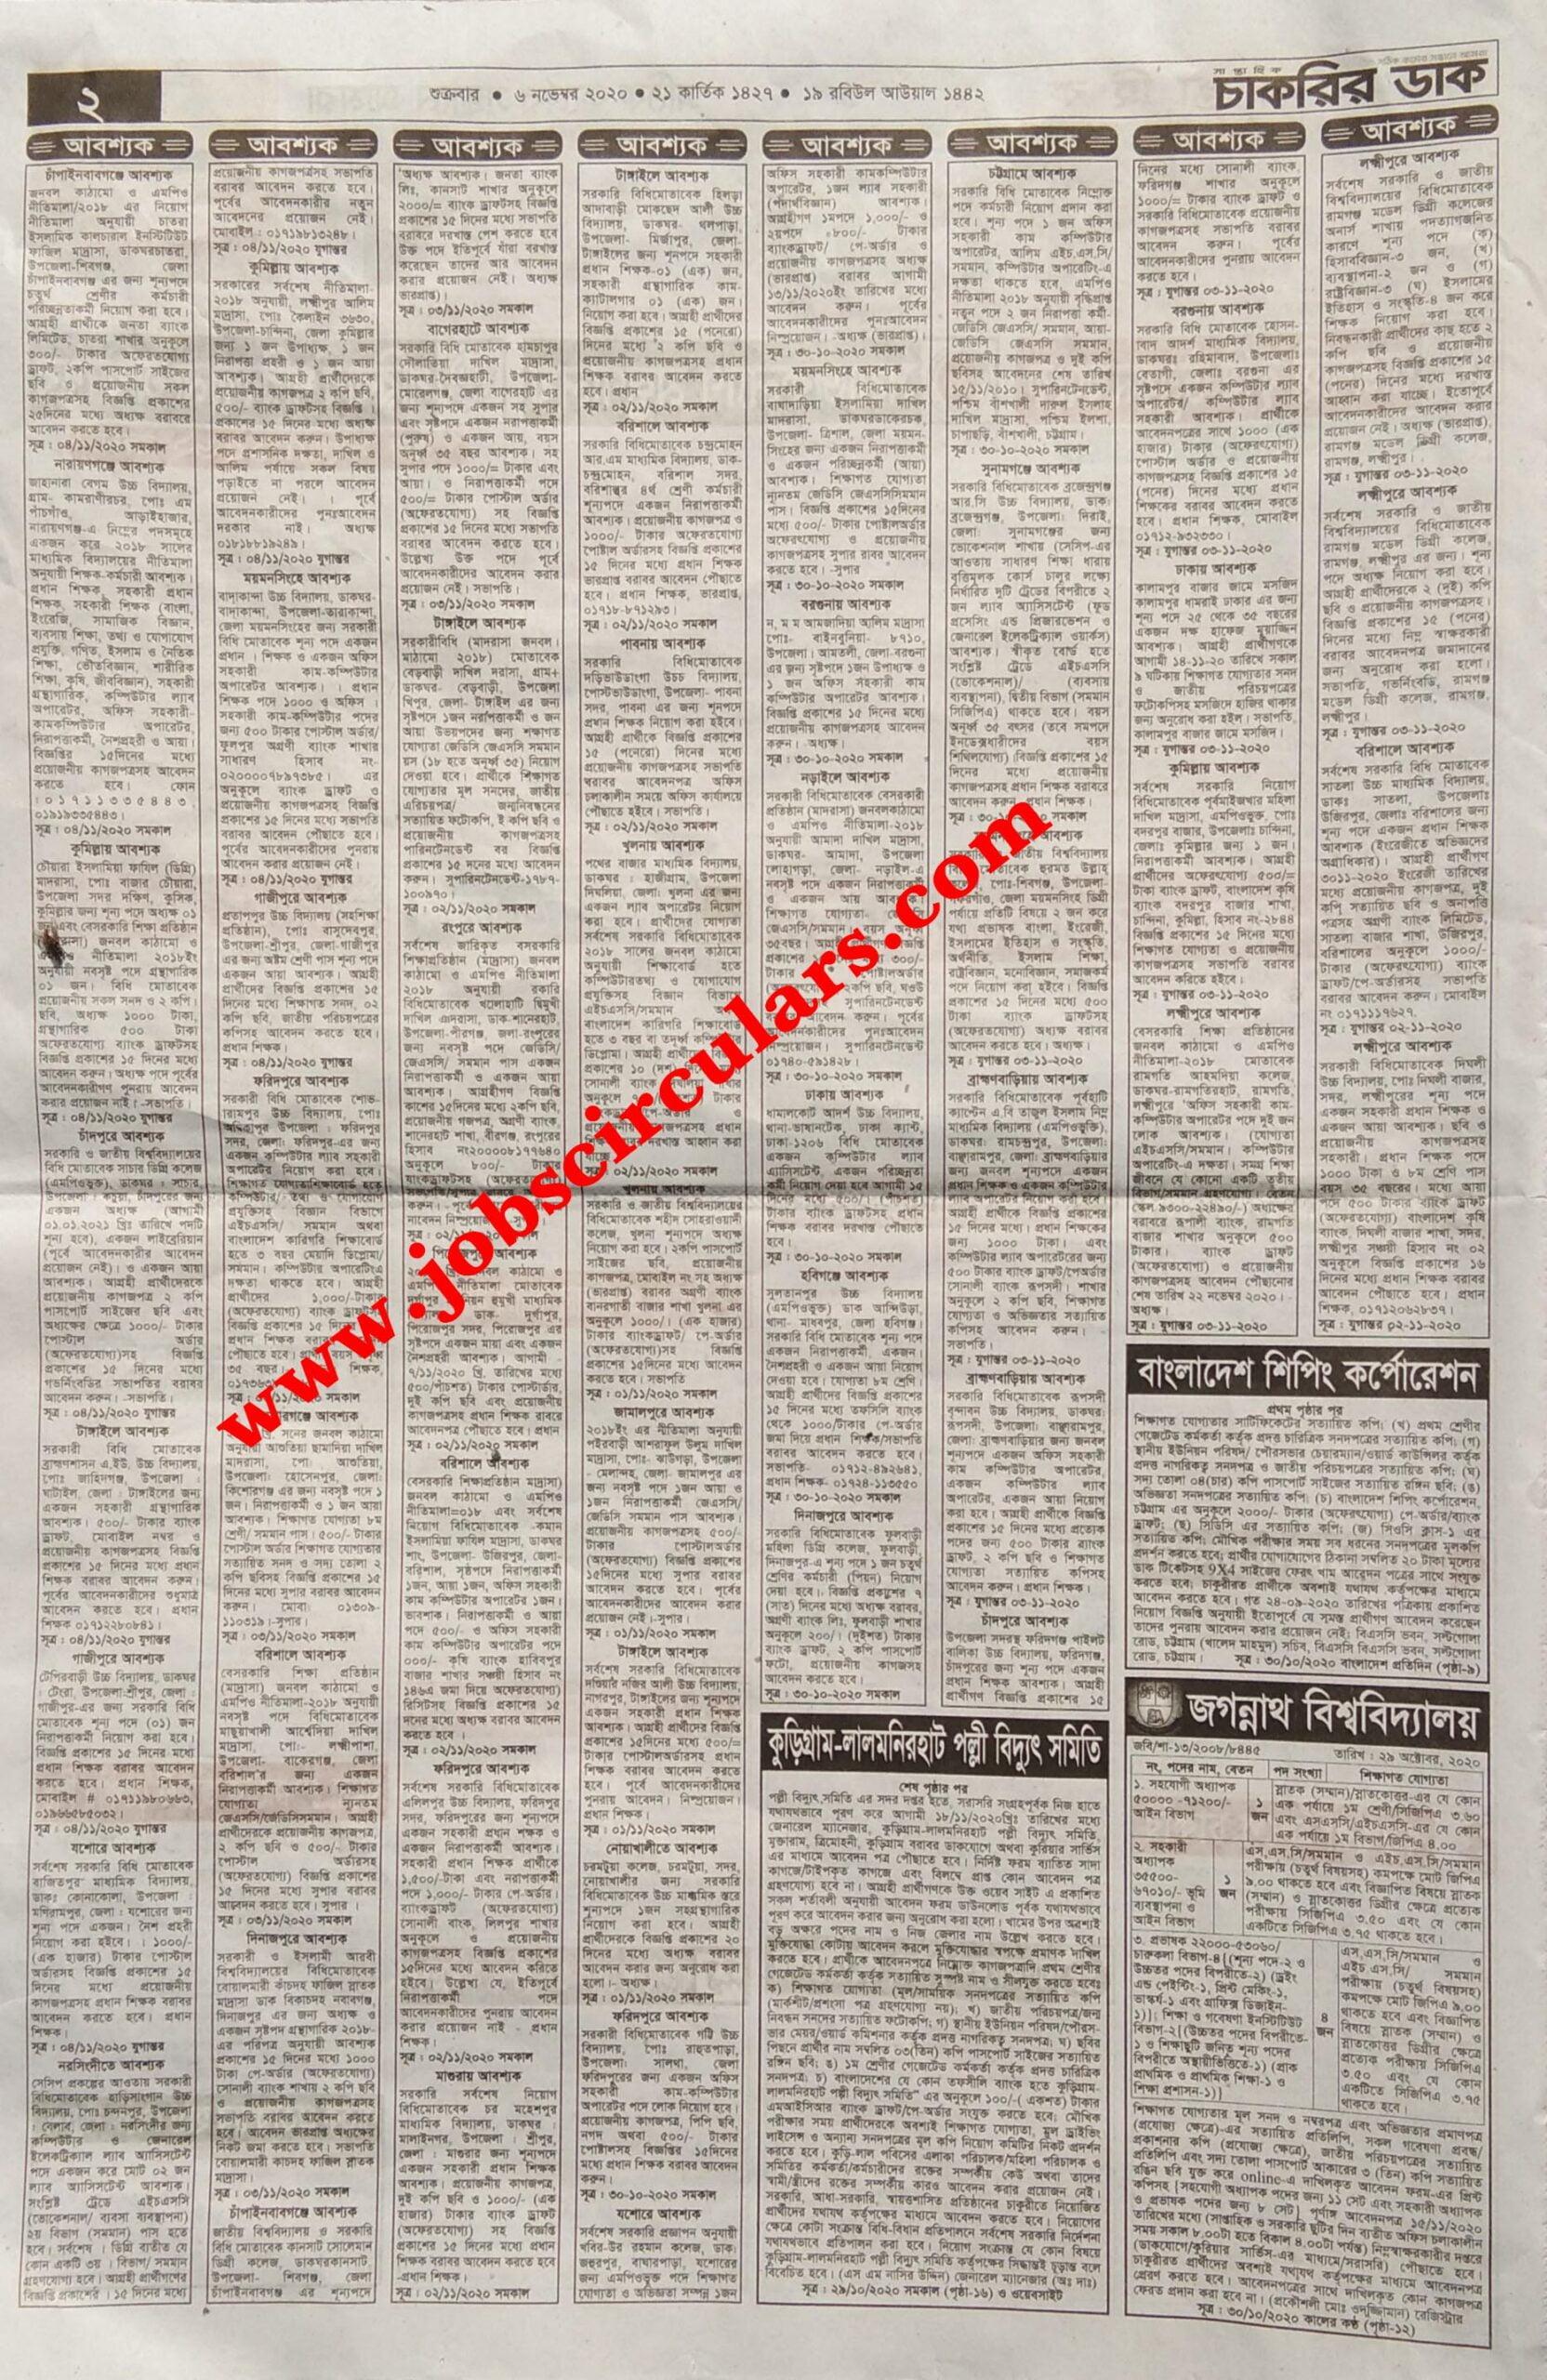 Chakrir Dak Weekly Newspaper 2 page